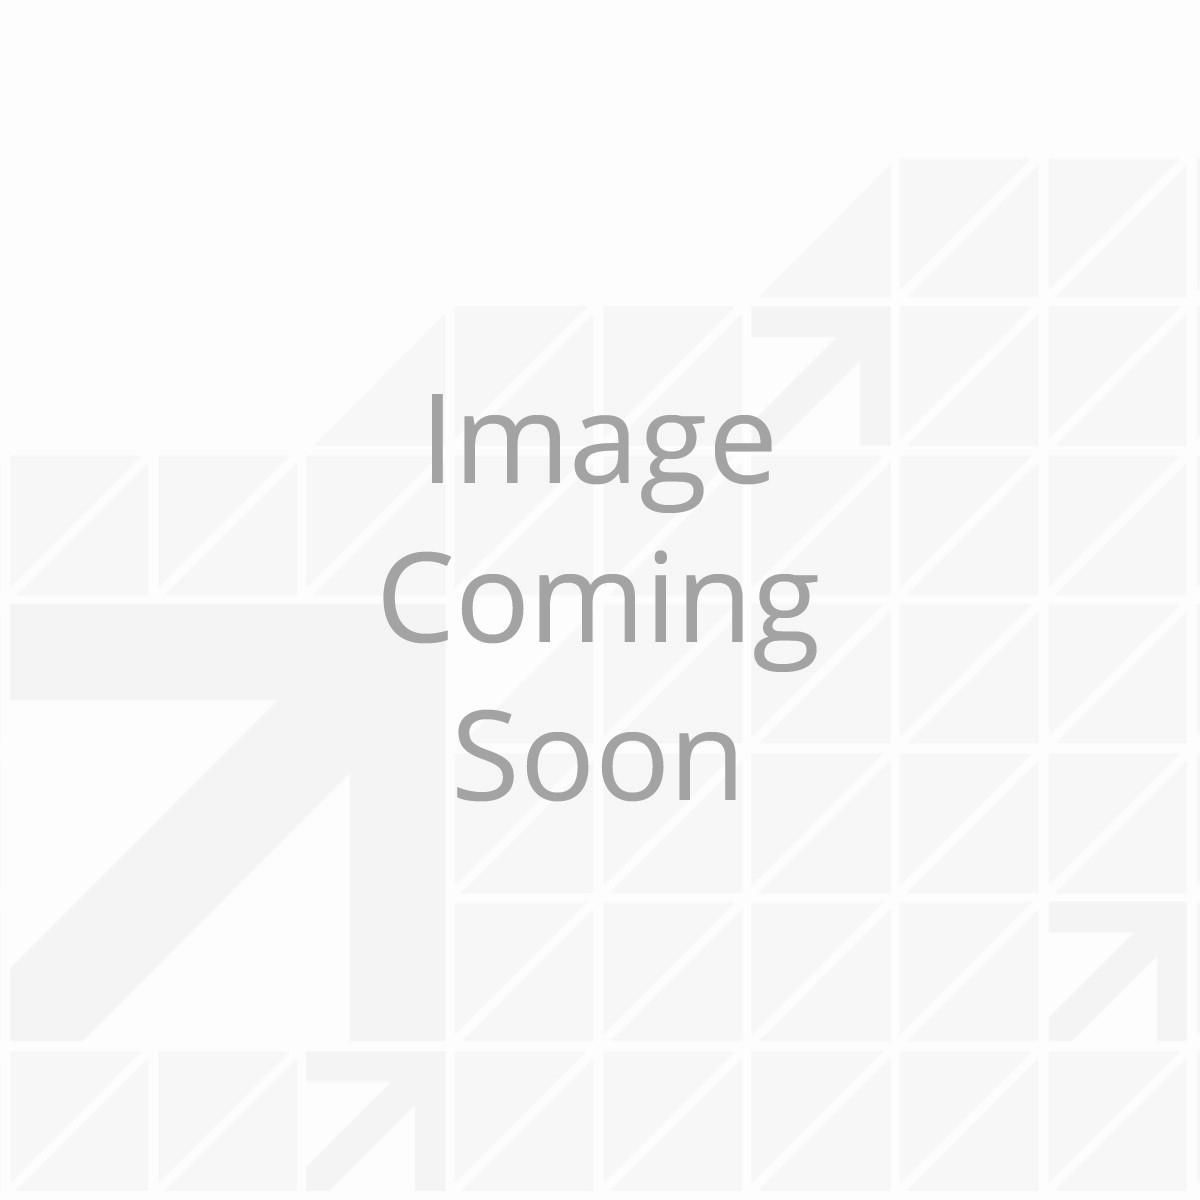 Control for 3-Valve Spring Return Jack with Remote Level (Short Wheel Base) - Power Gear® Leveling